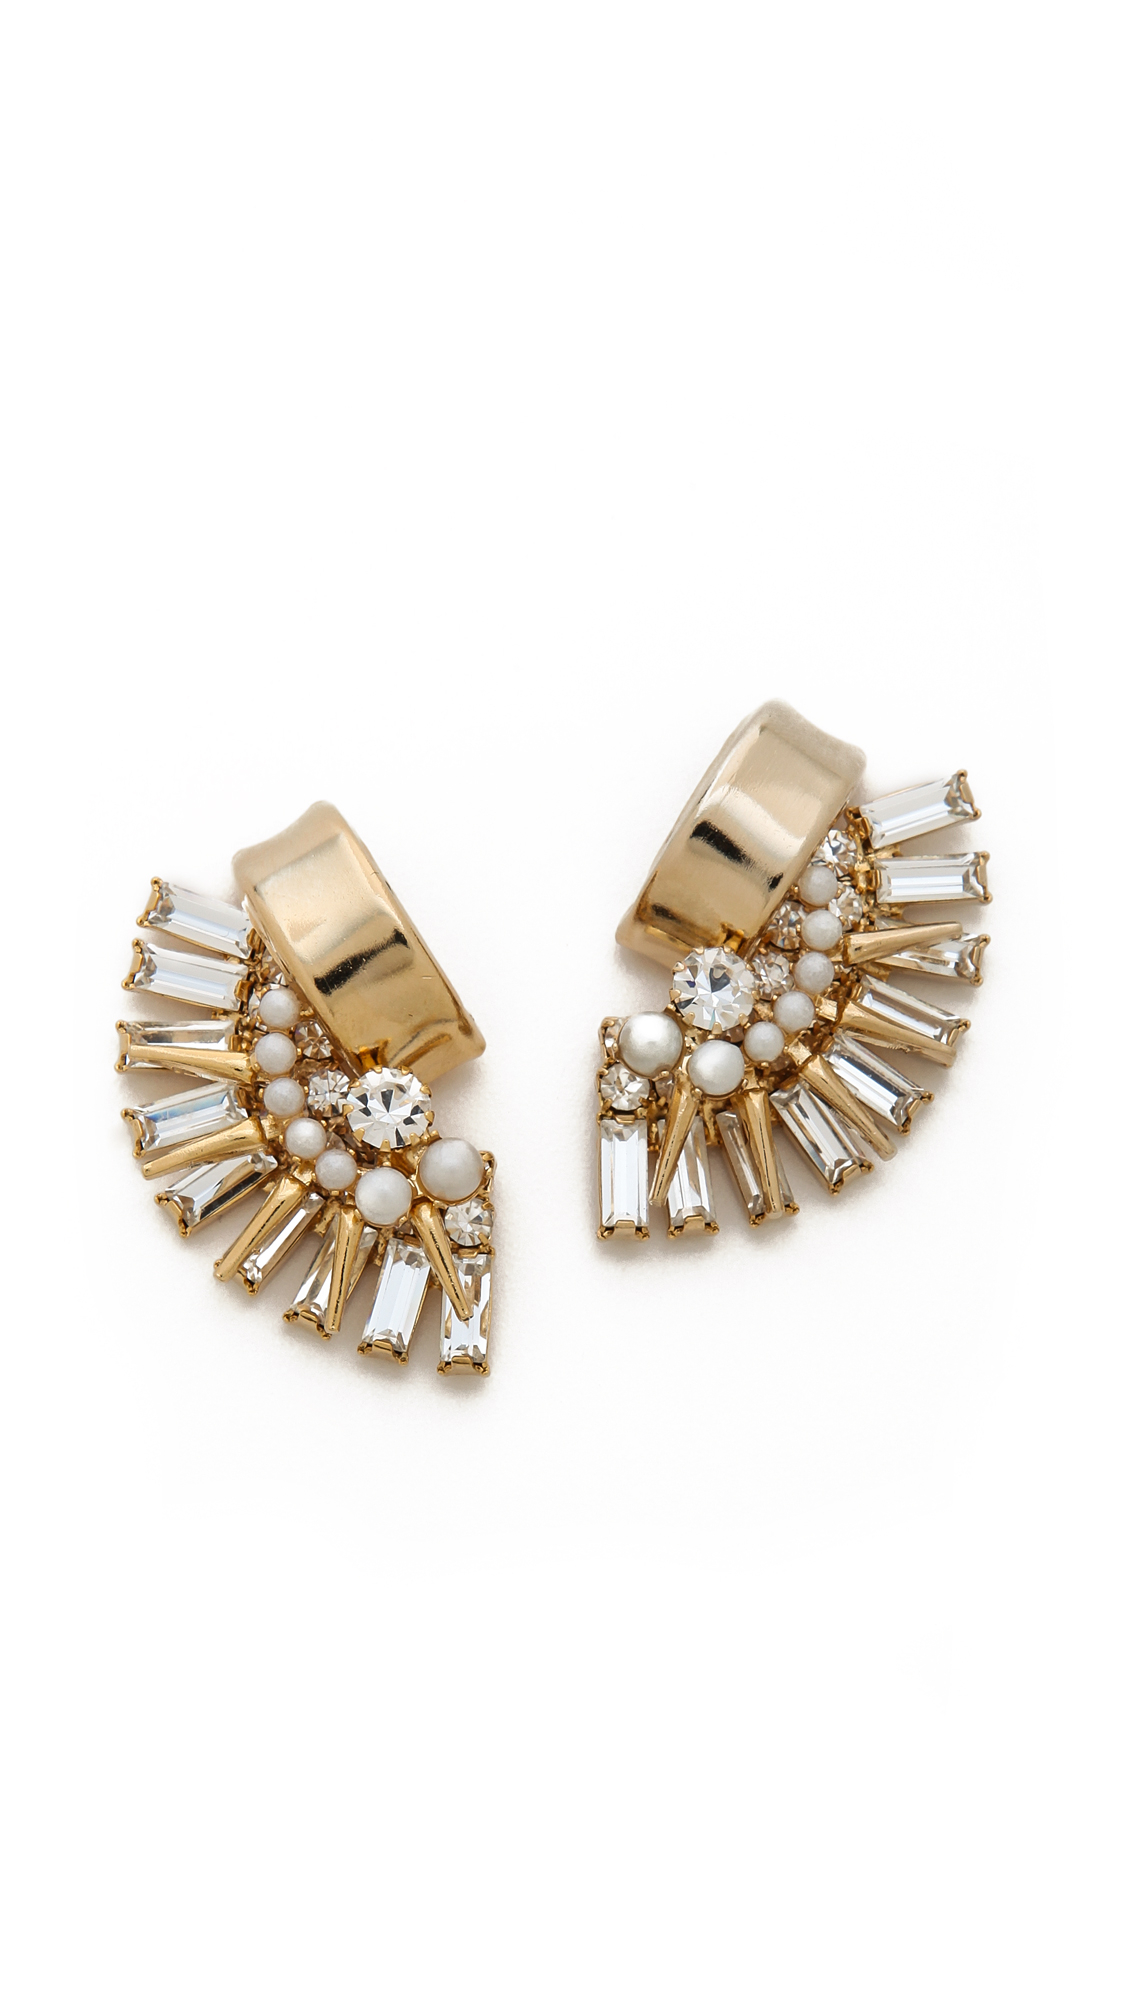 Elizabeth Cole Crescent Ring in Metallic Gold 4INoE